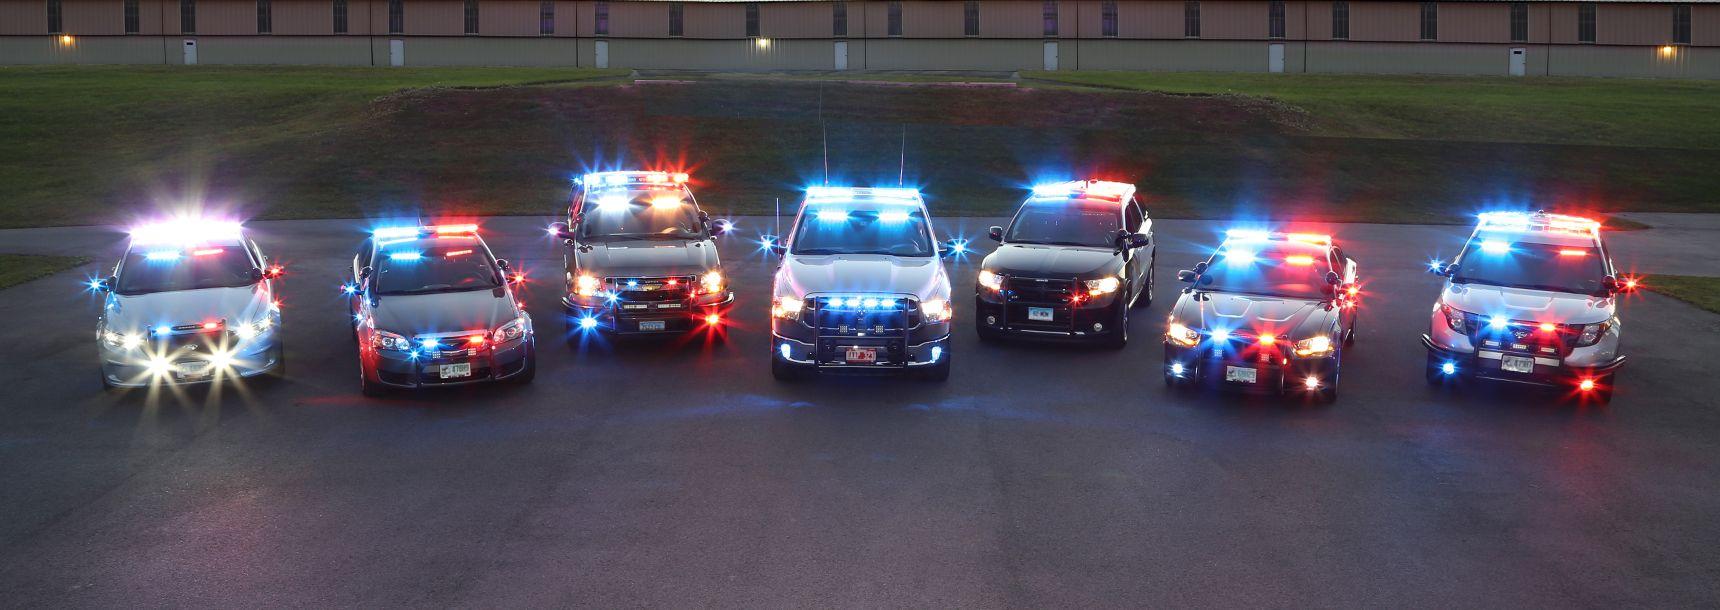 Whelen Engineering Police Cars Emergency Vehicles